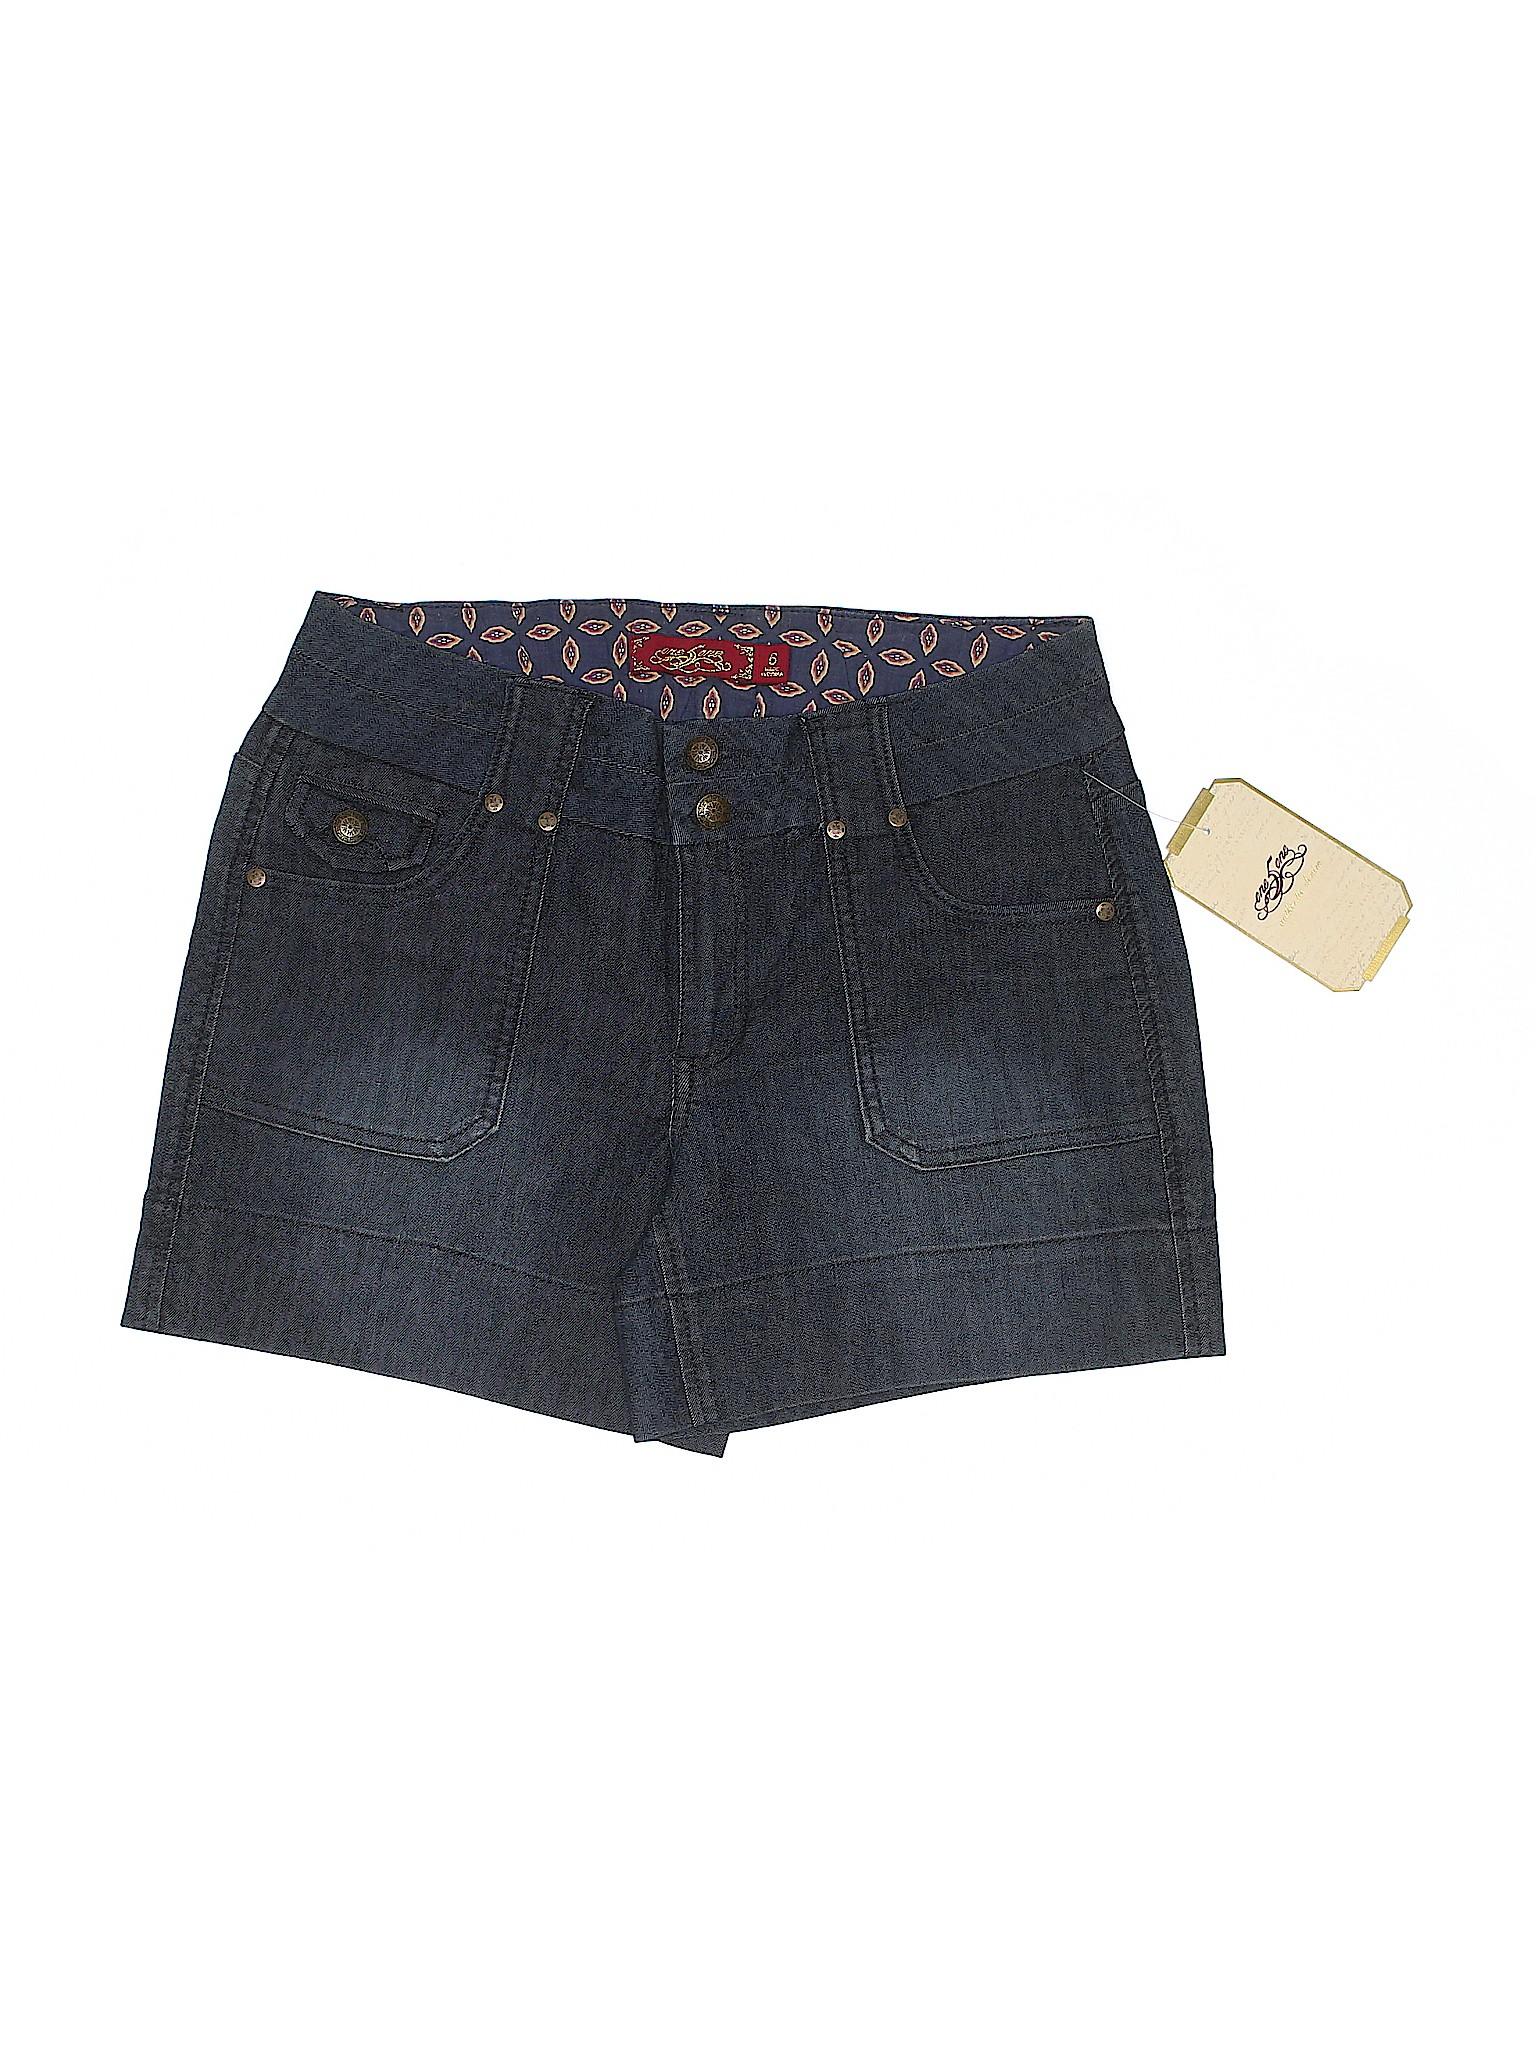 One One Denim Shorts Boutique 5 TwqOdYY